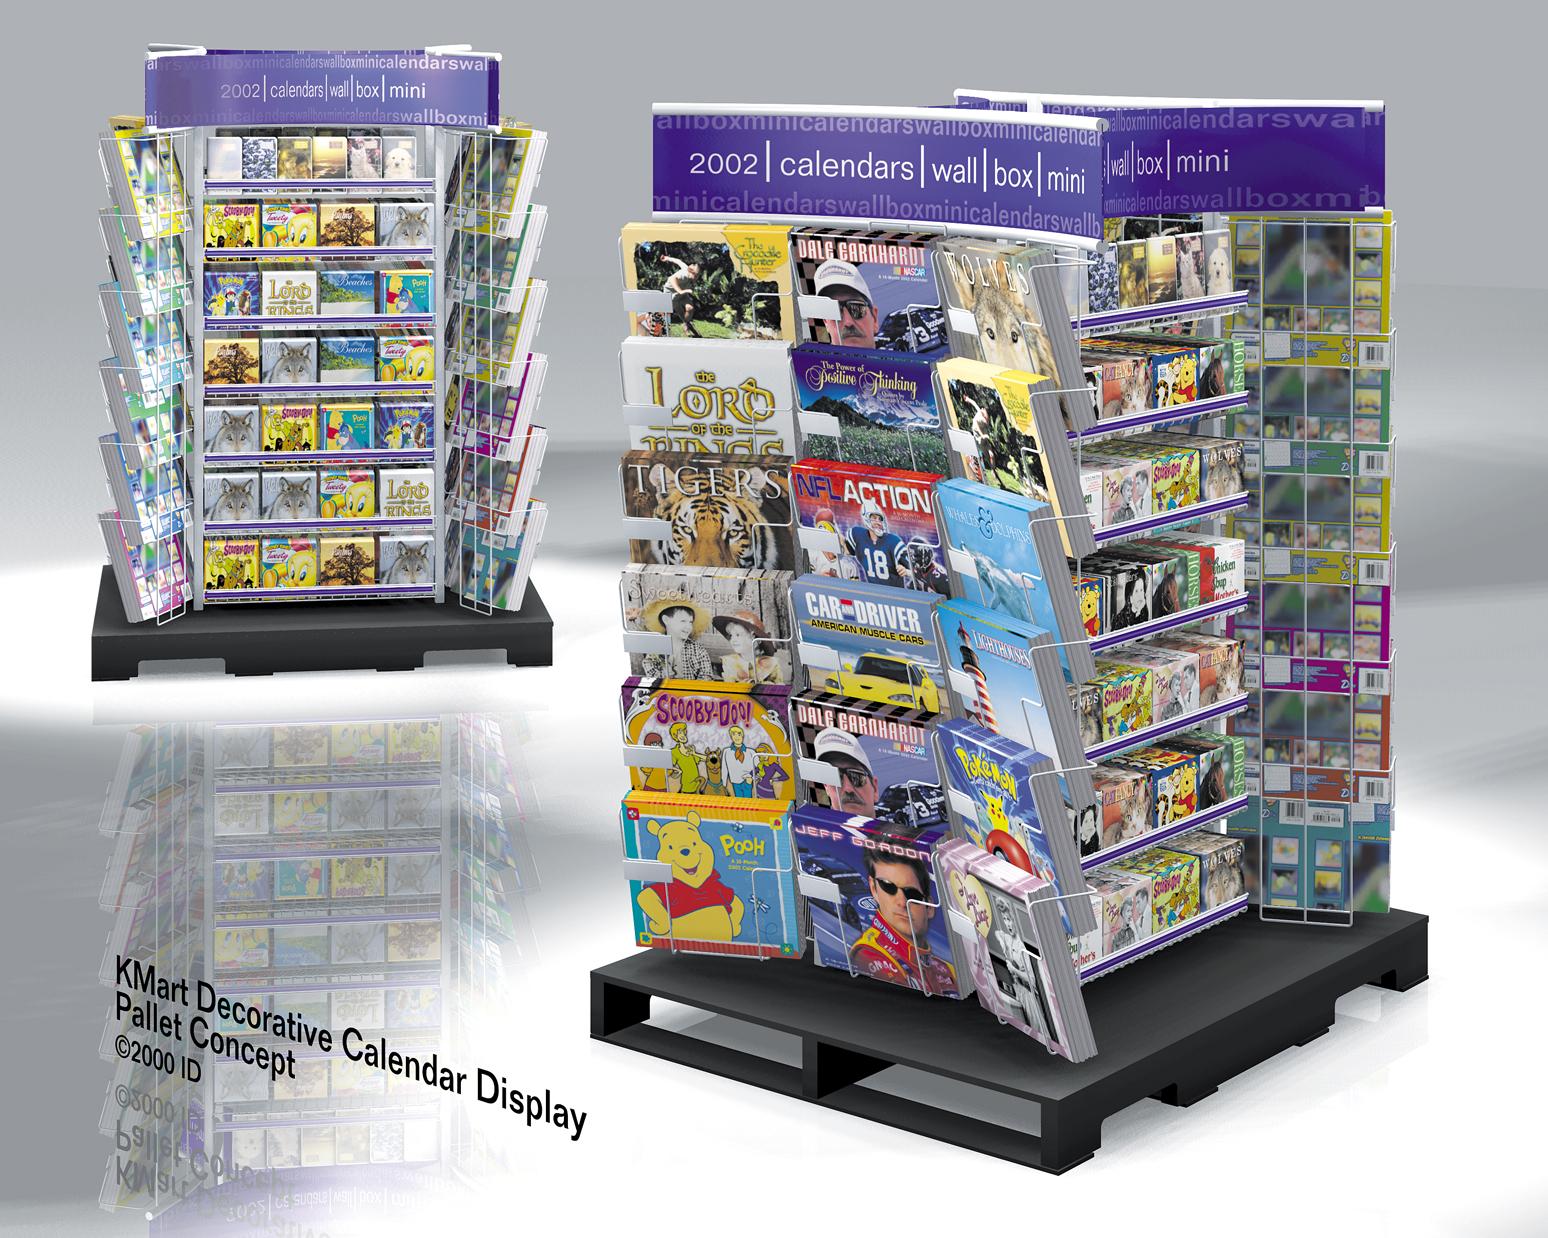 Kmart calendar display.jpg